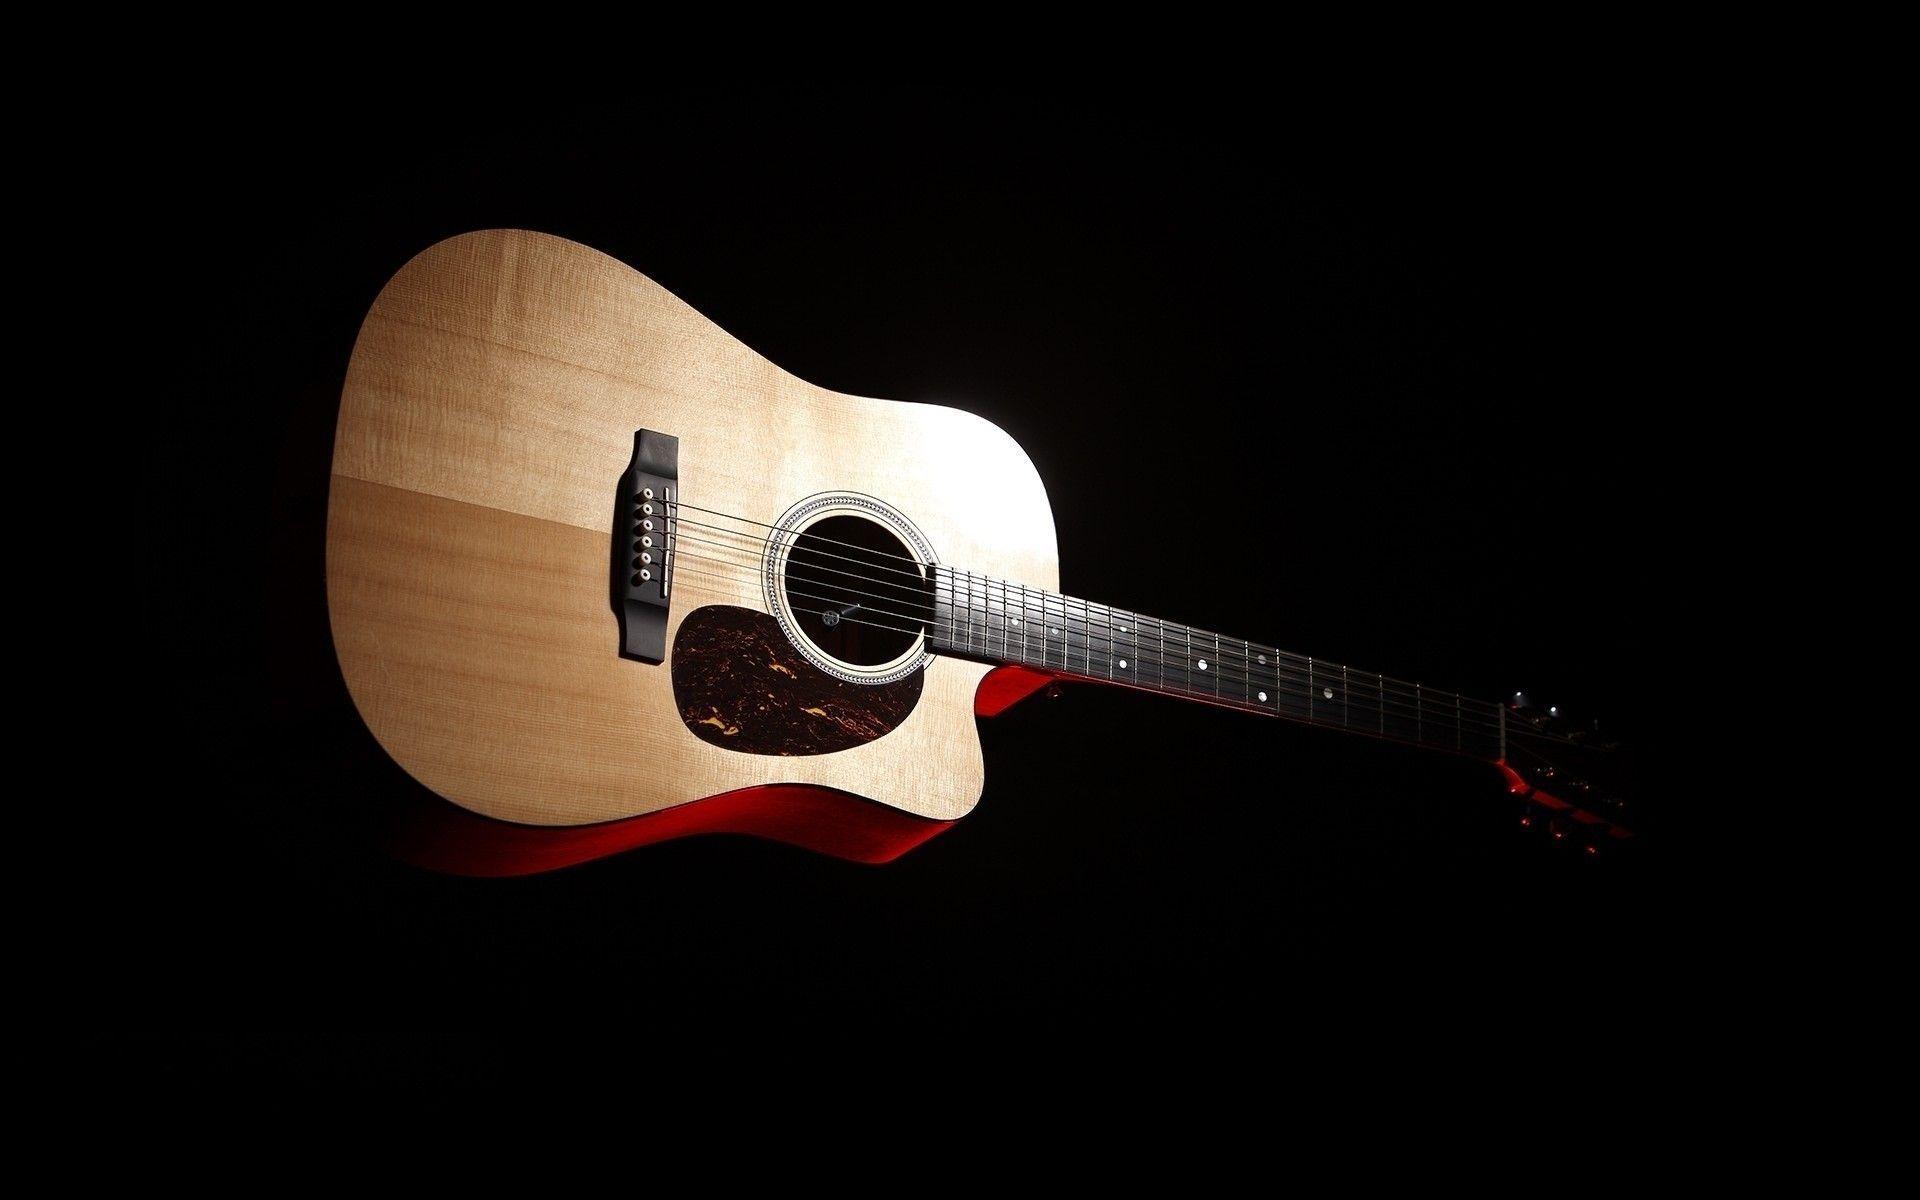 Acoustic Guitar, Free Download Wallpaper